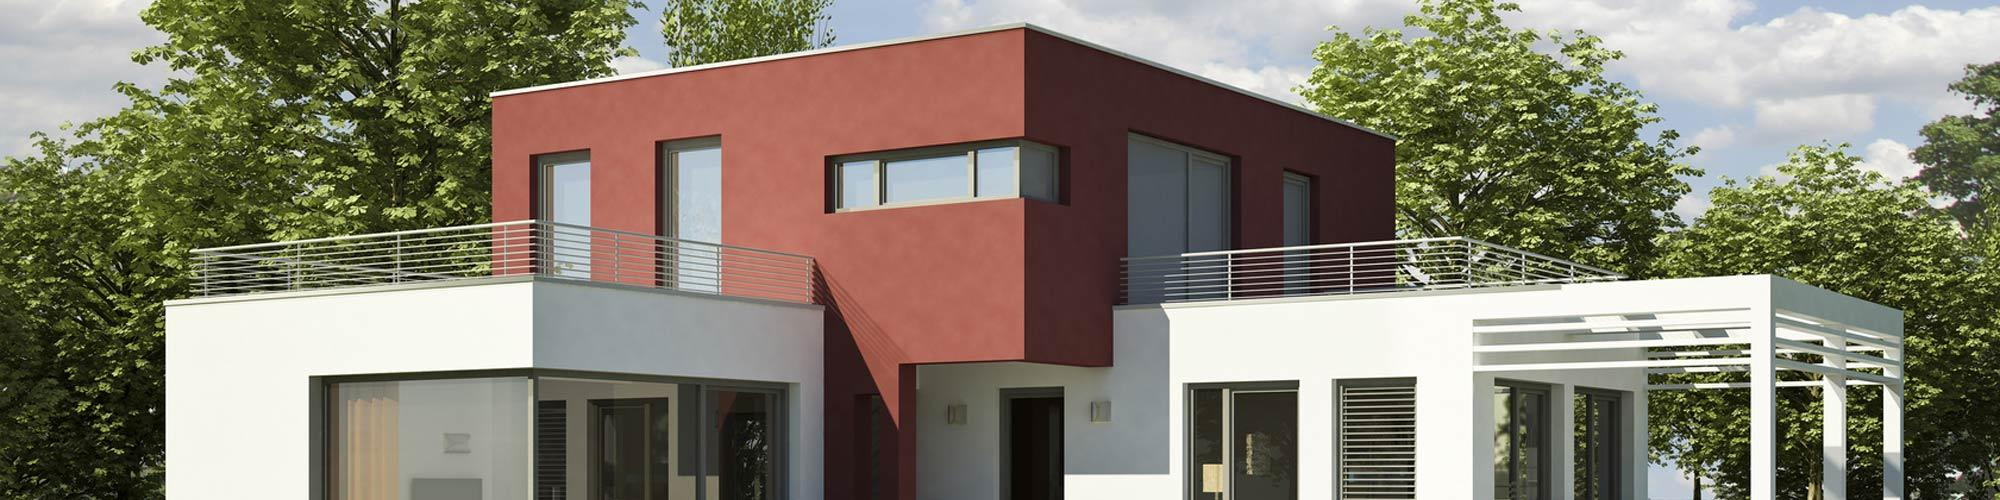 immoprofis rheinmain finanzierung. Black Bedroom Furniture Sets. Home Design Ideas